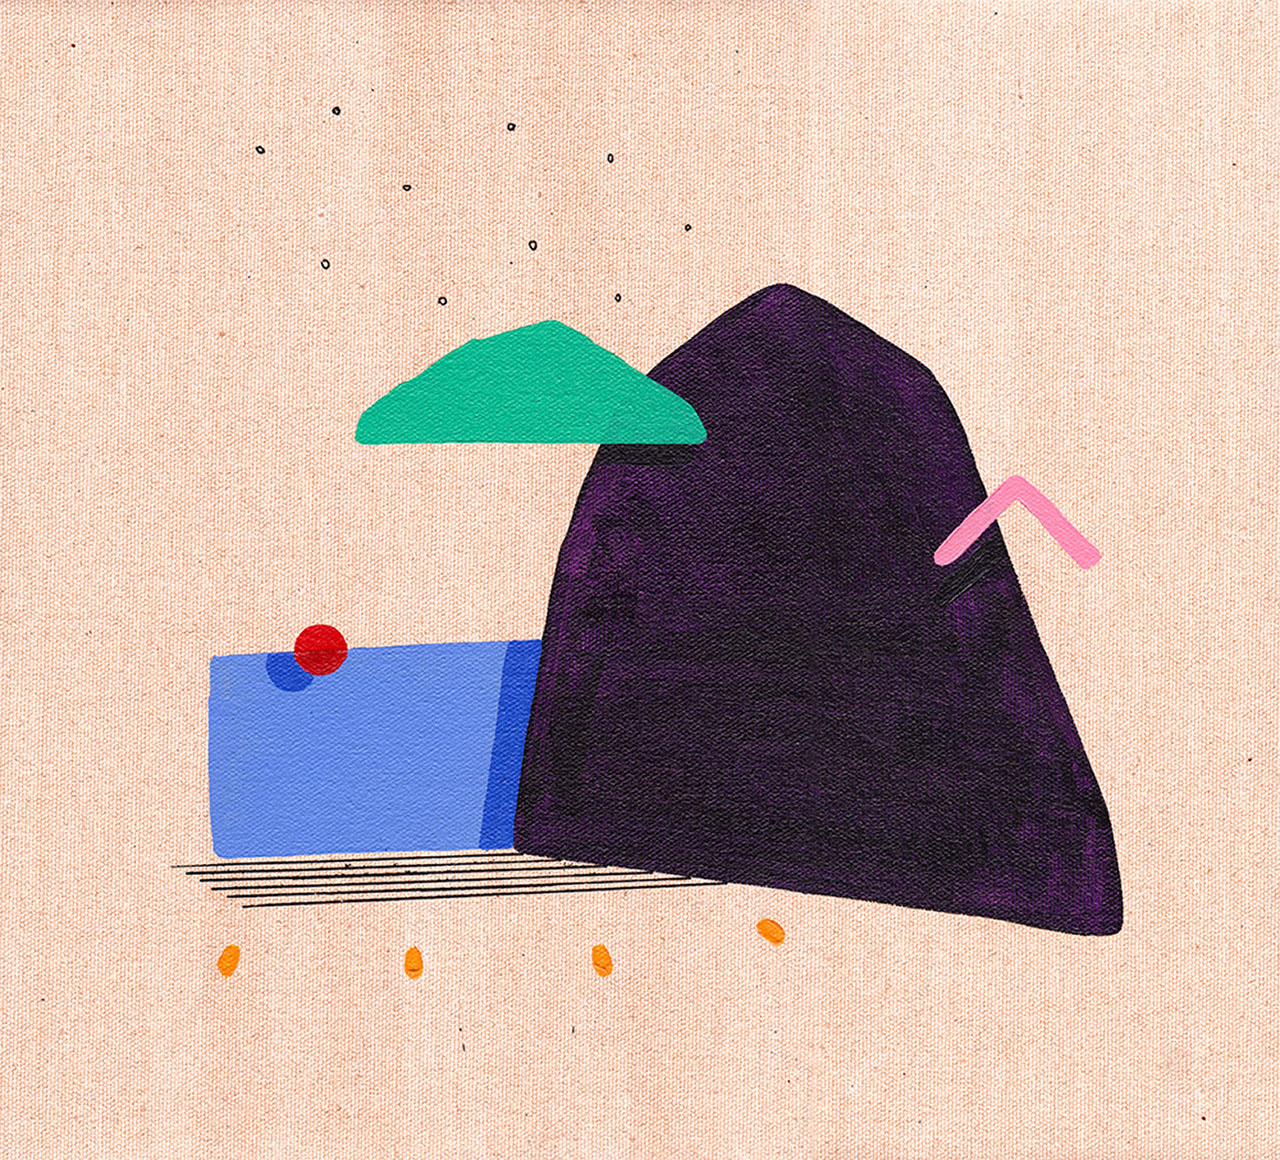 Purple Mountain by David Esquivel